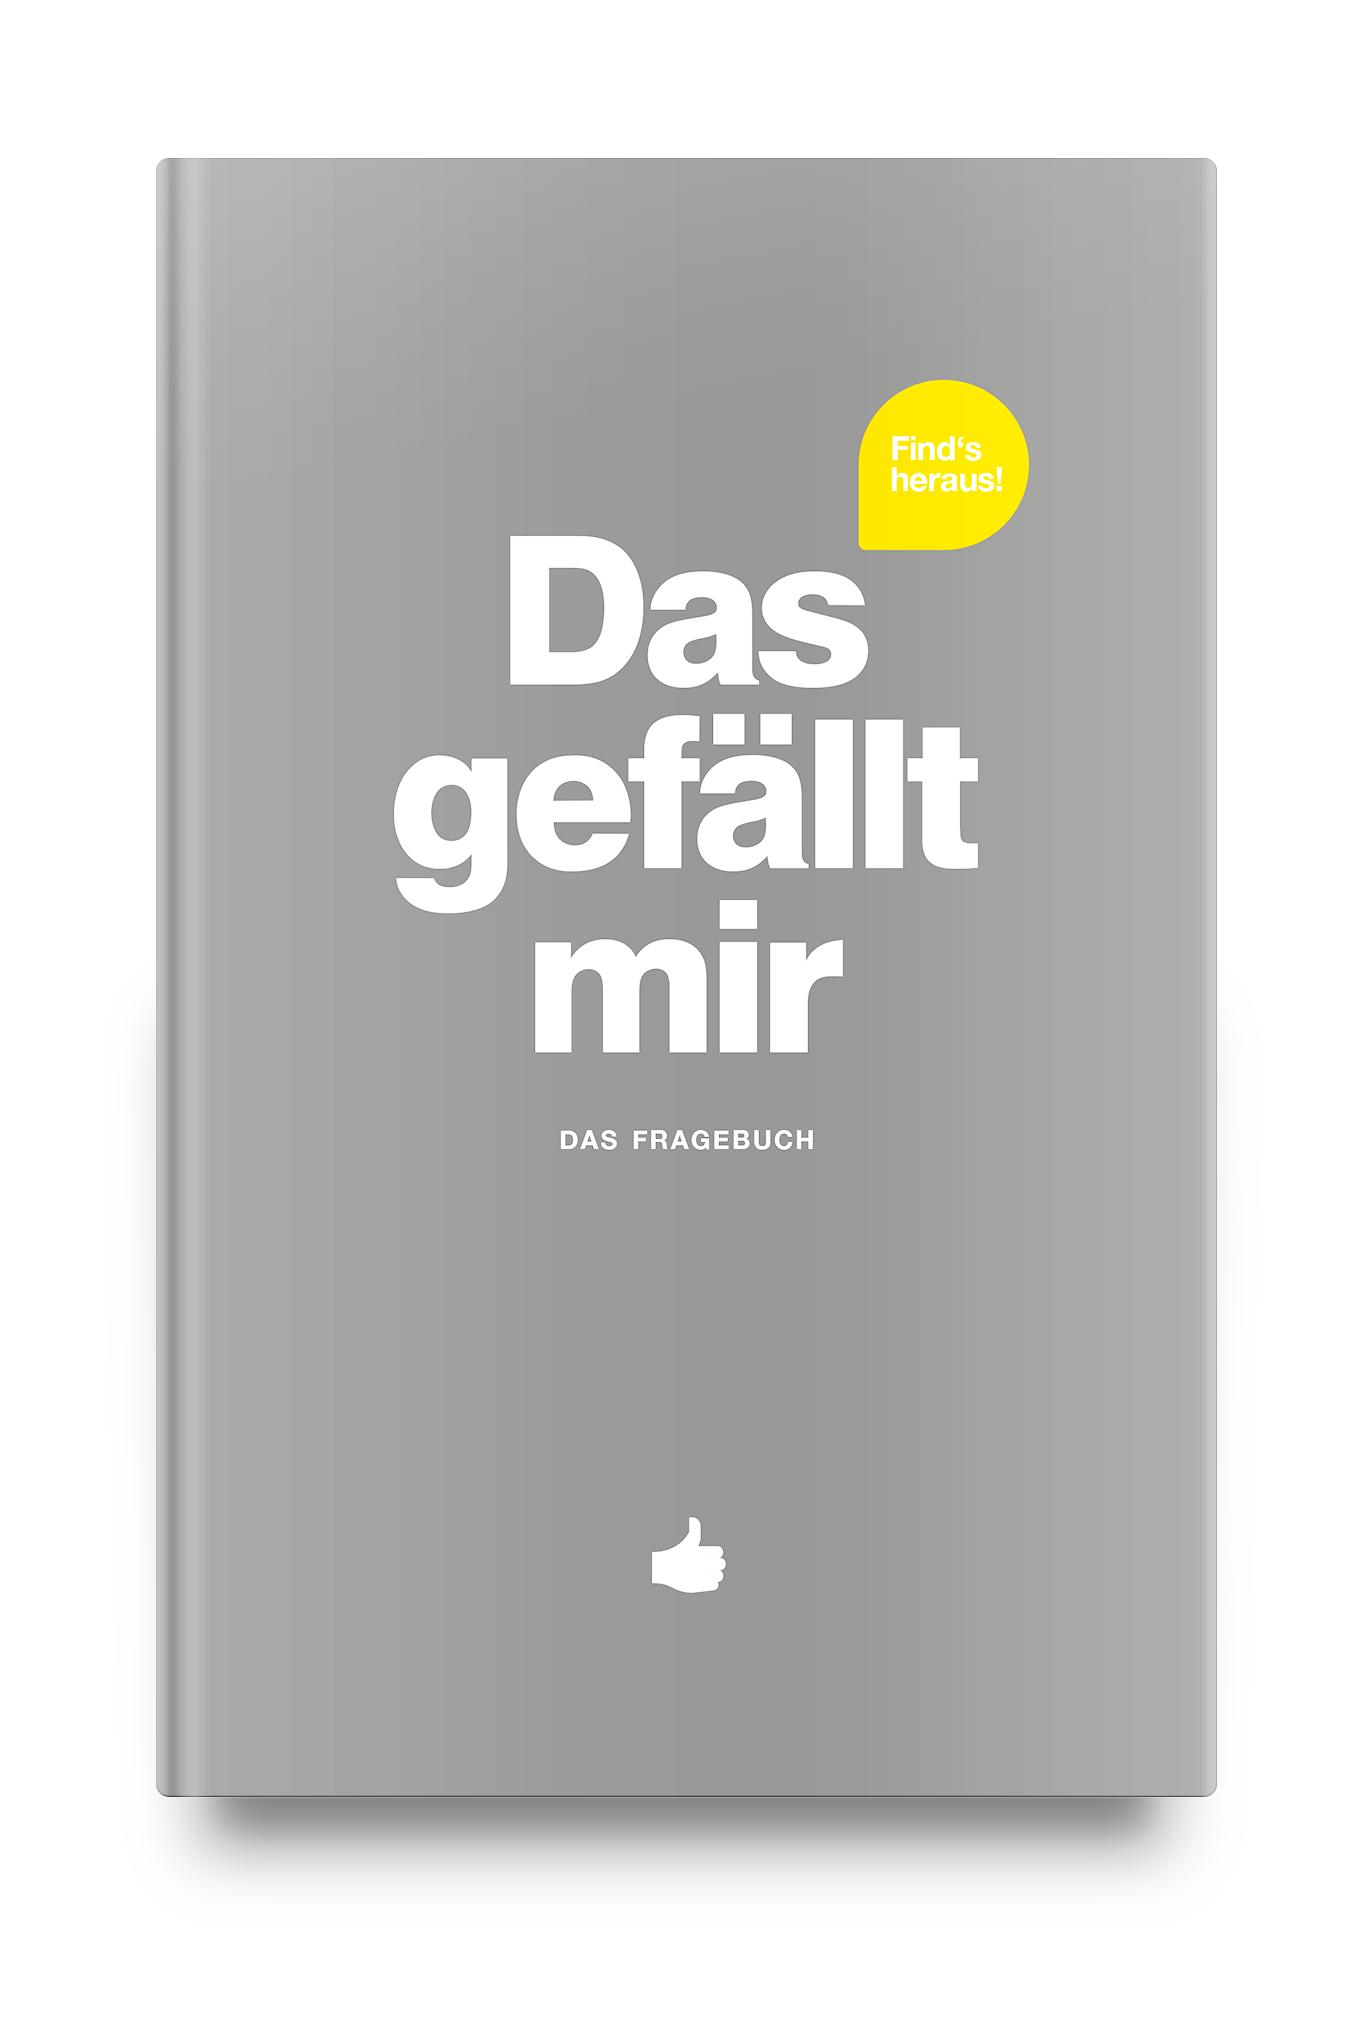 cover_wil_grau.jpg